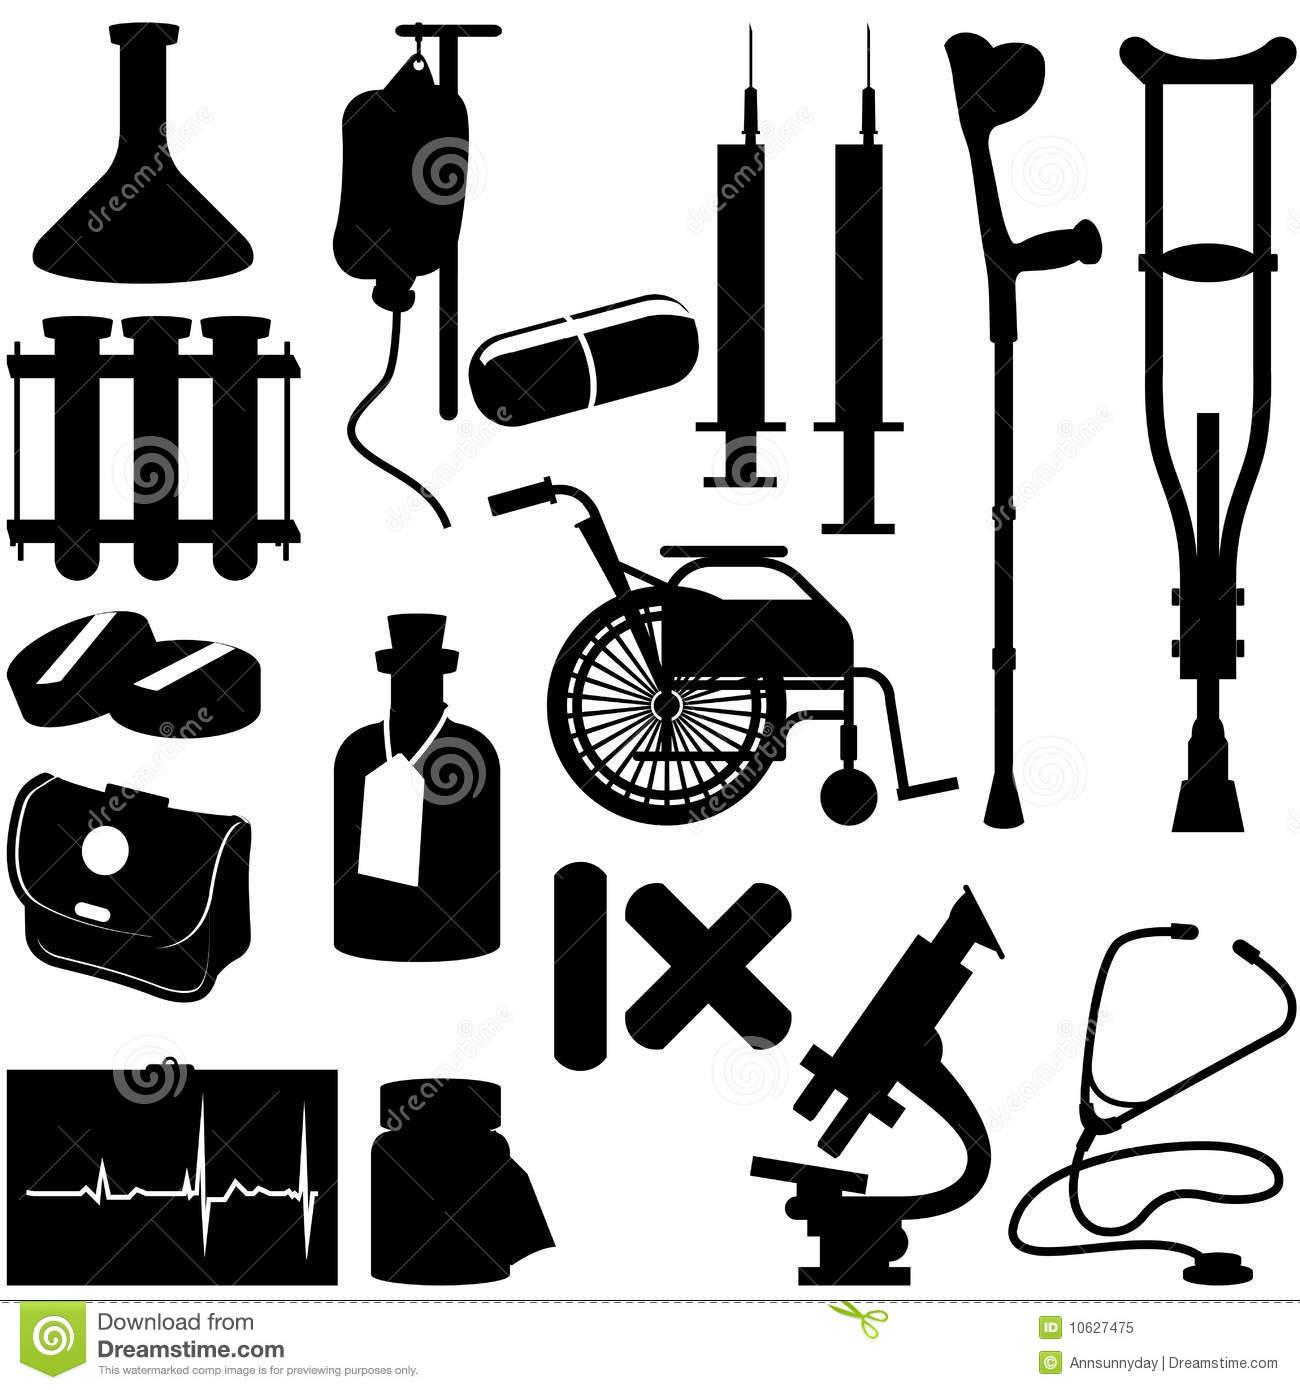 Home Medical Supplies Clip Art.